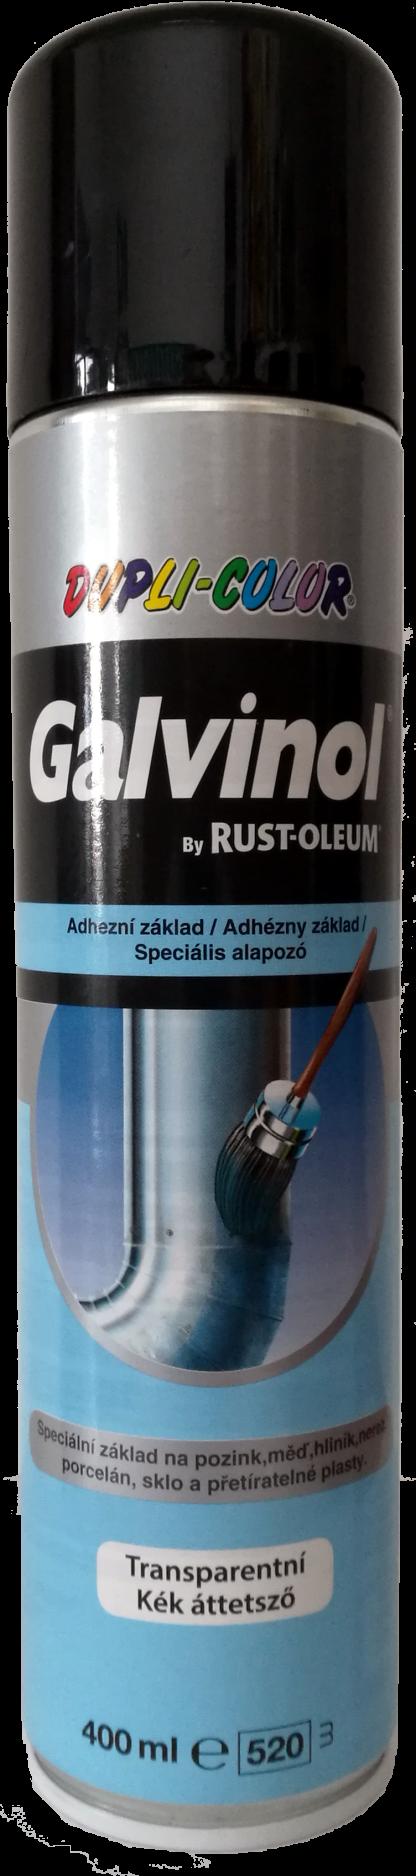 Galvinol könnyűfém alapozó spray